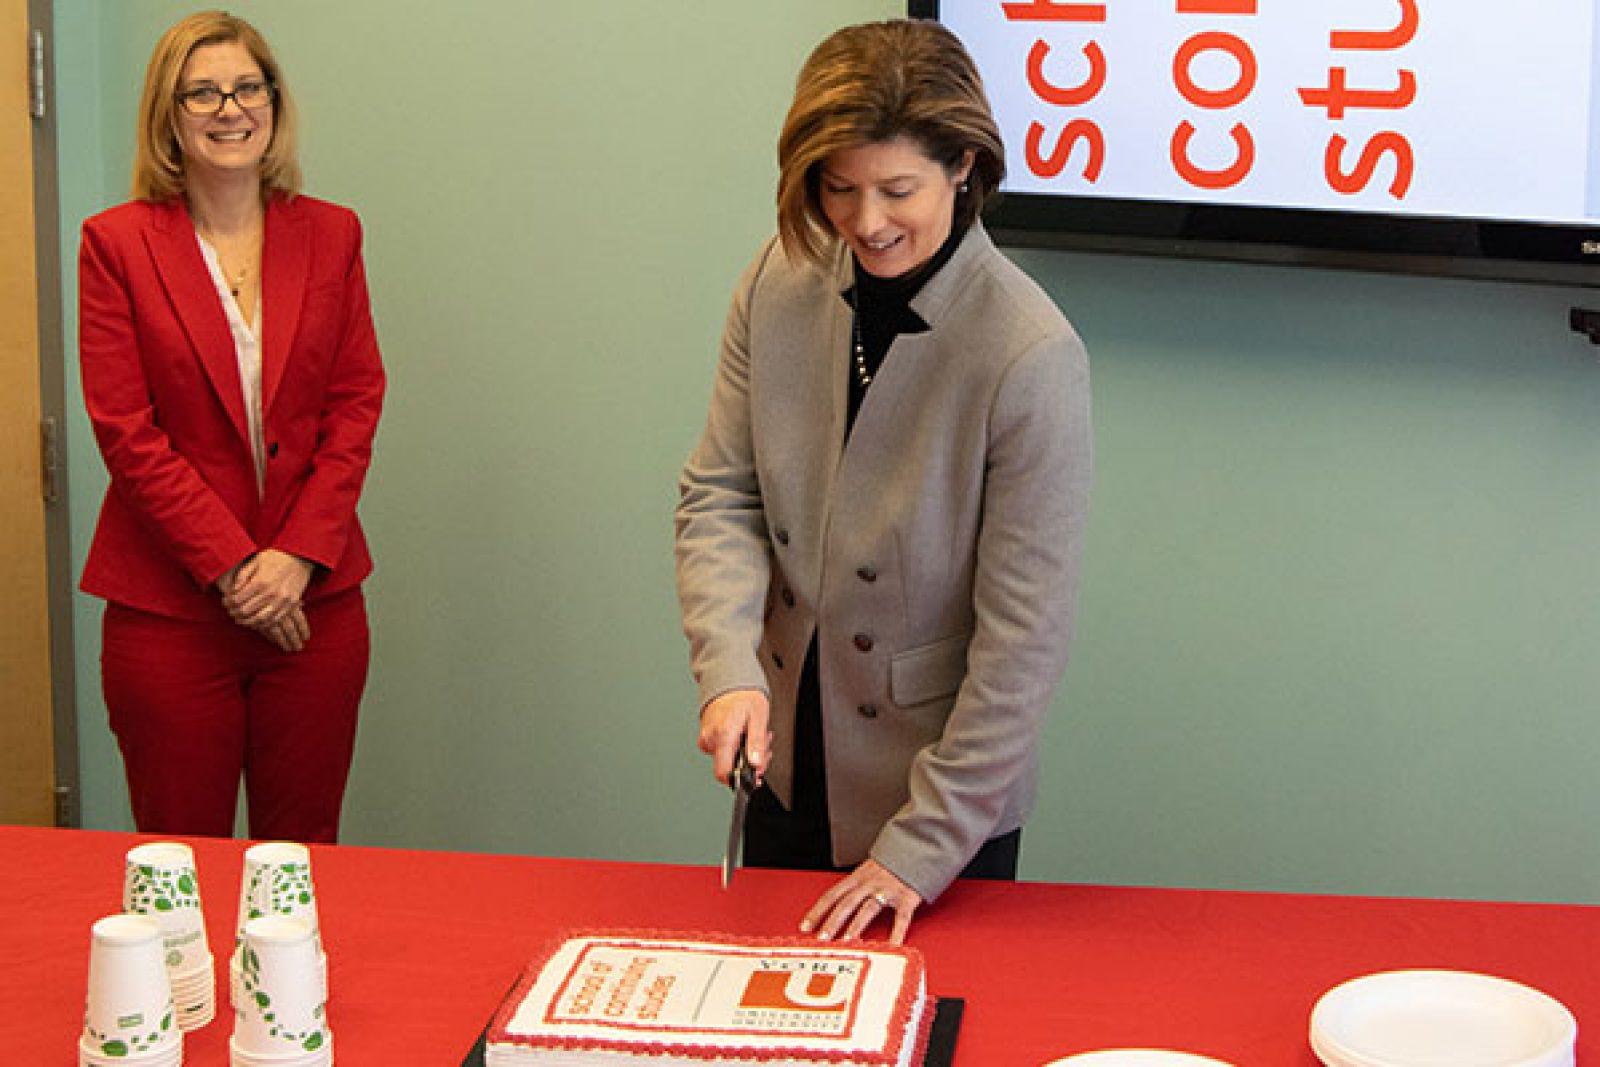 Tracey cutting cake